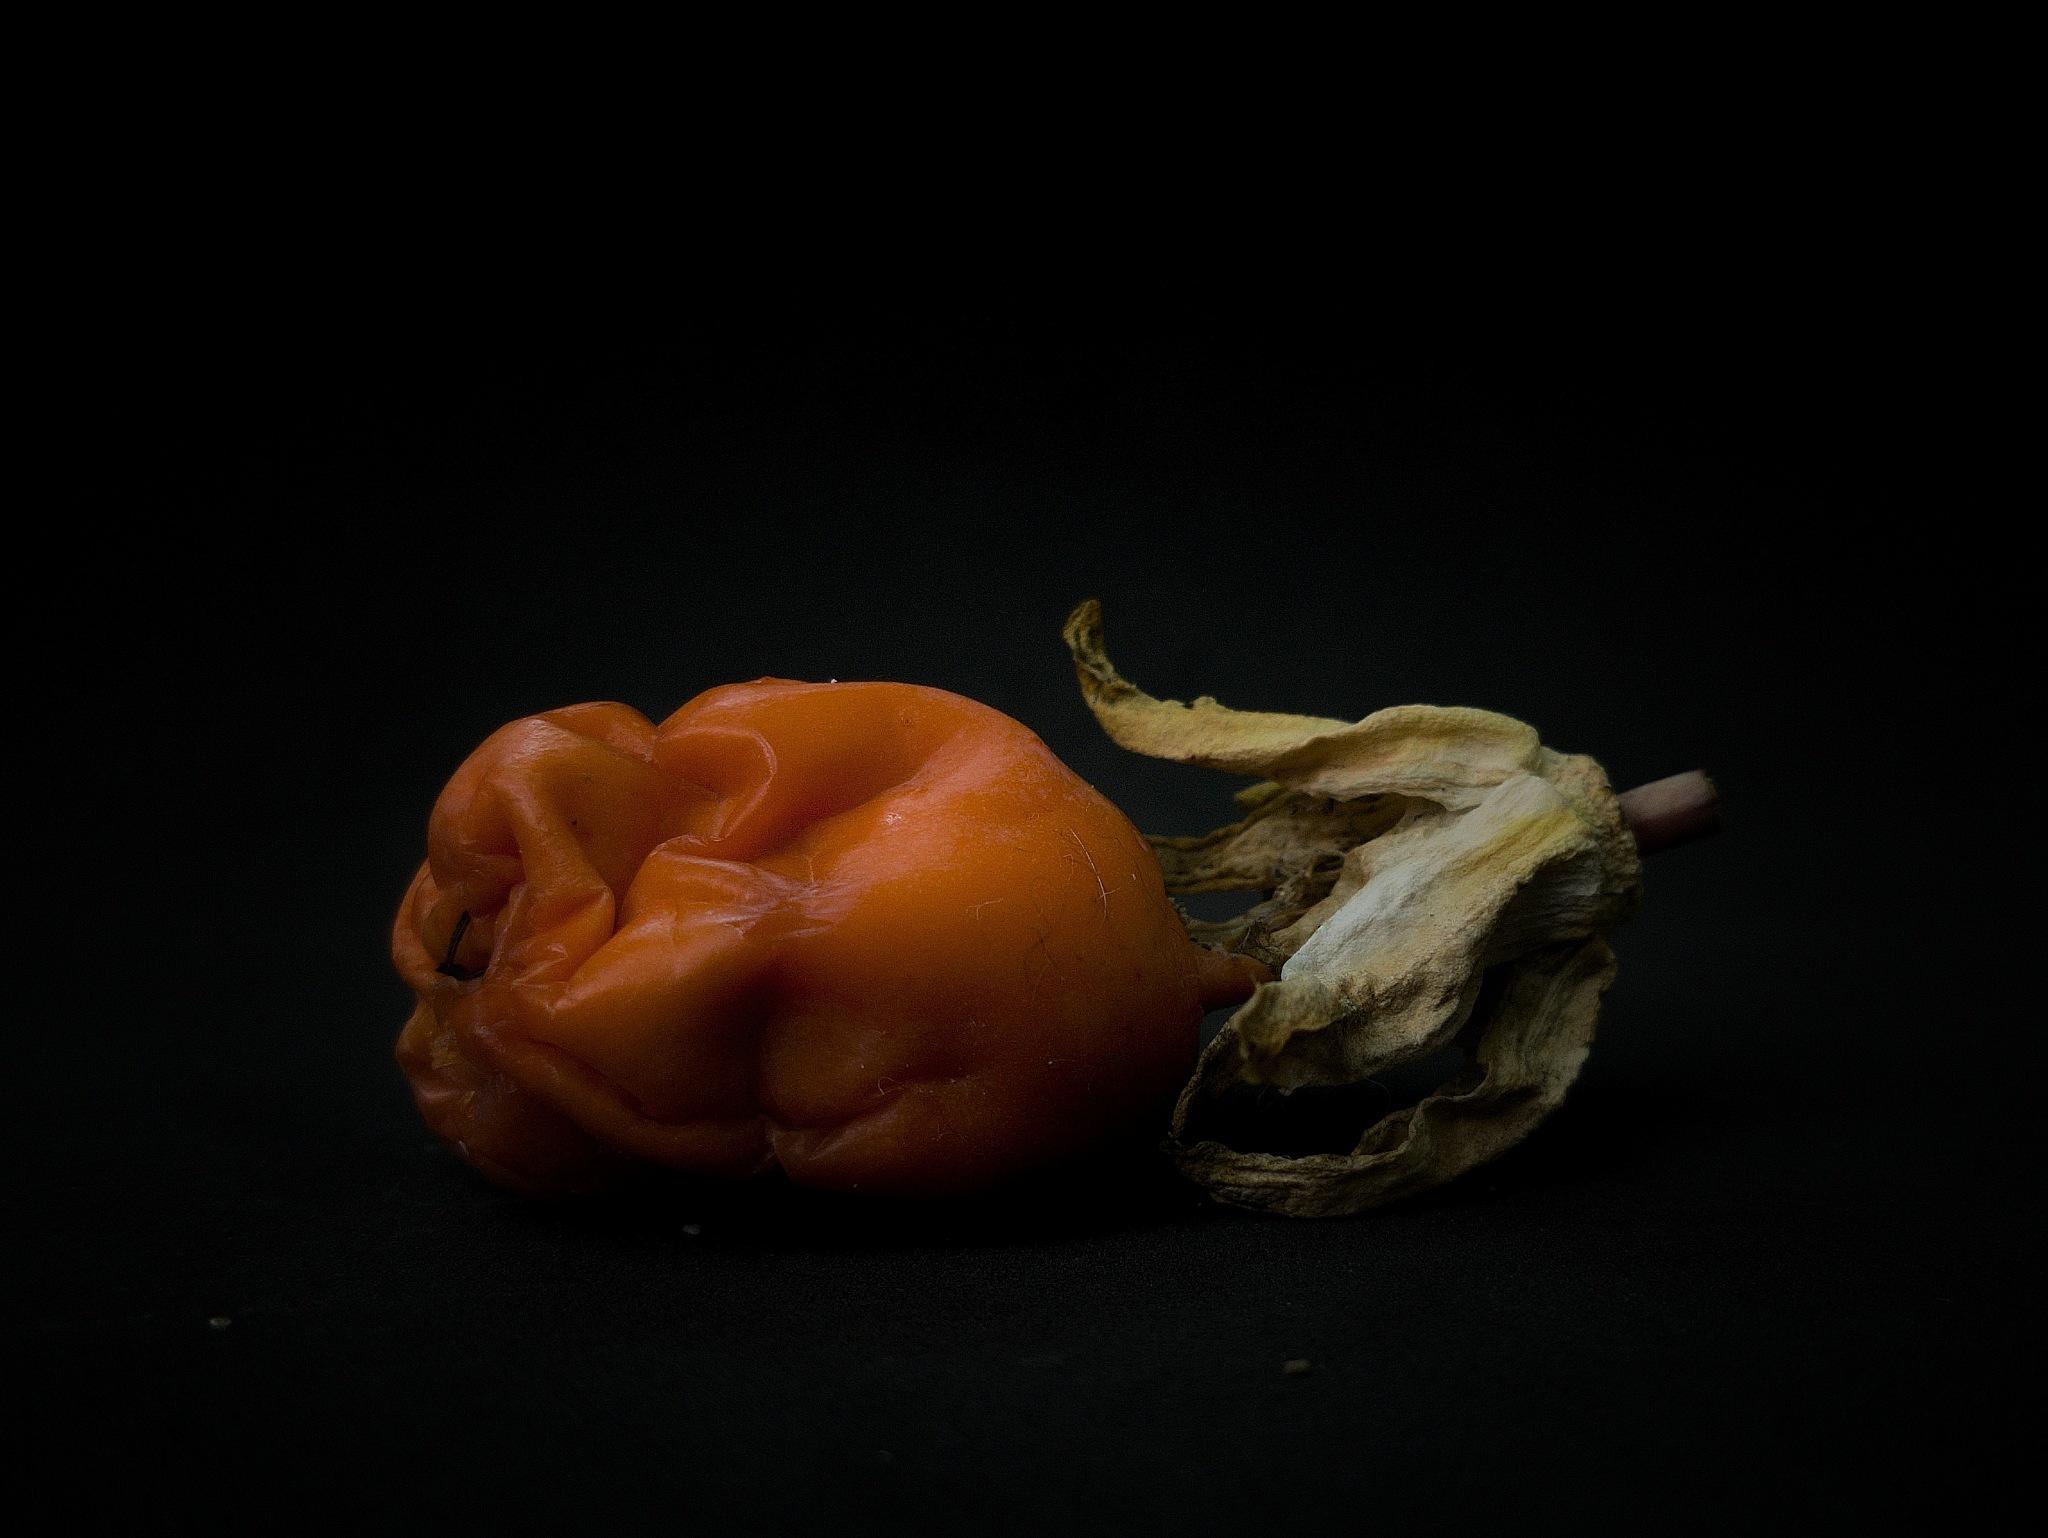 passiflora fruit by Ludmila Kozinkova